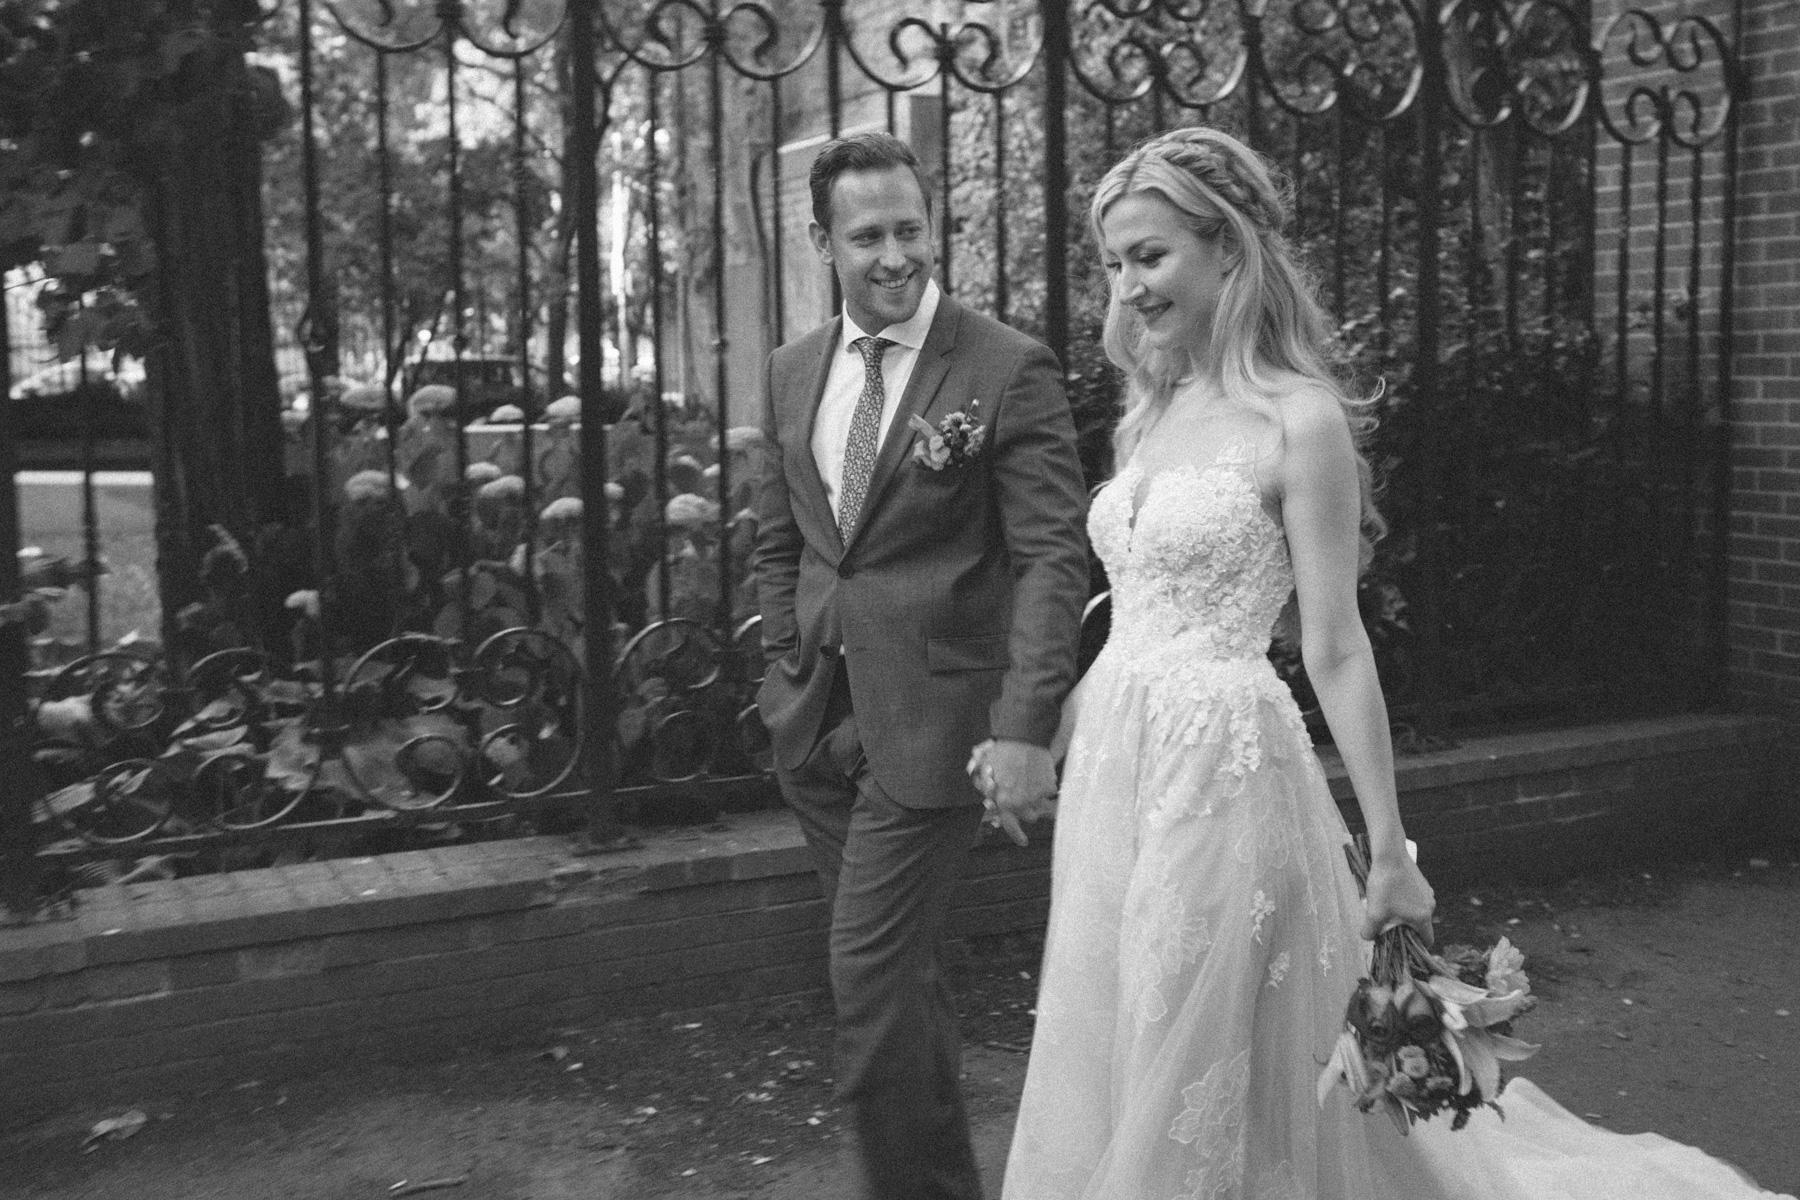 La-Maquette-wedding-by-Toronto-modern-wedding-photographer-Sam-Wong_22.jpg